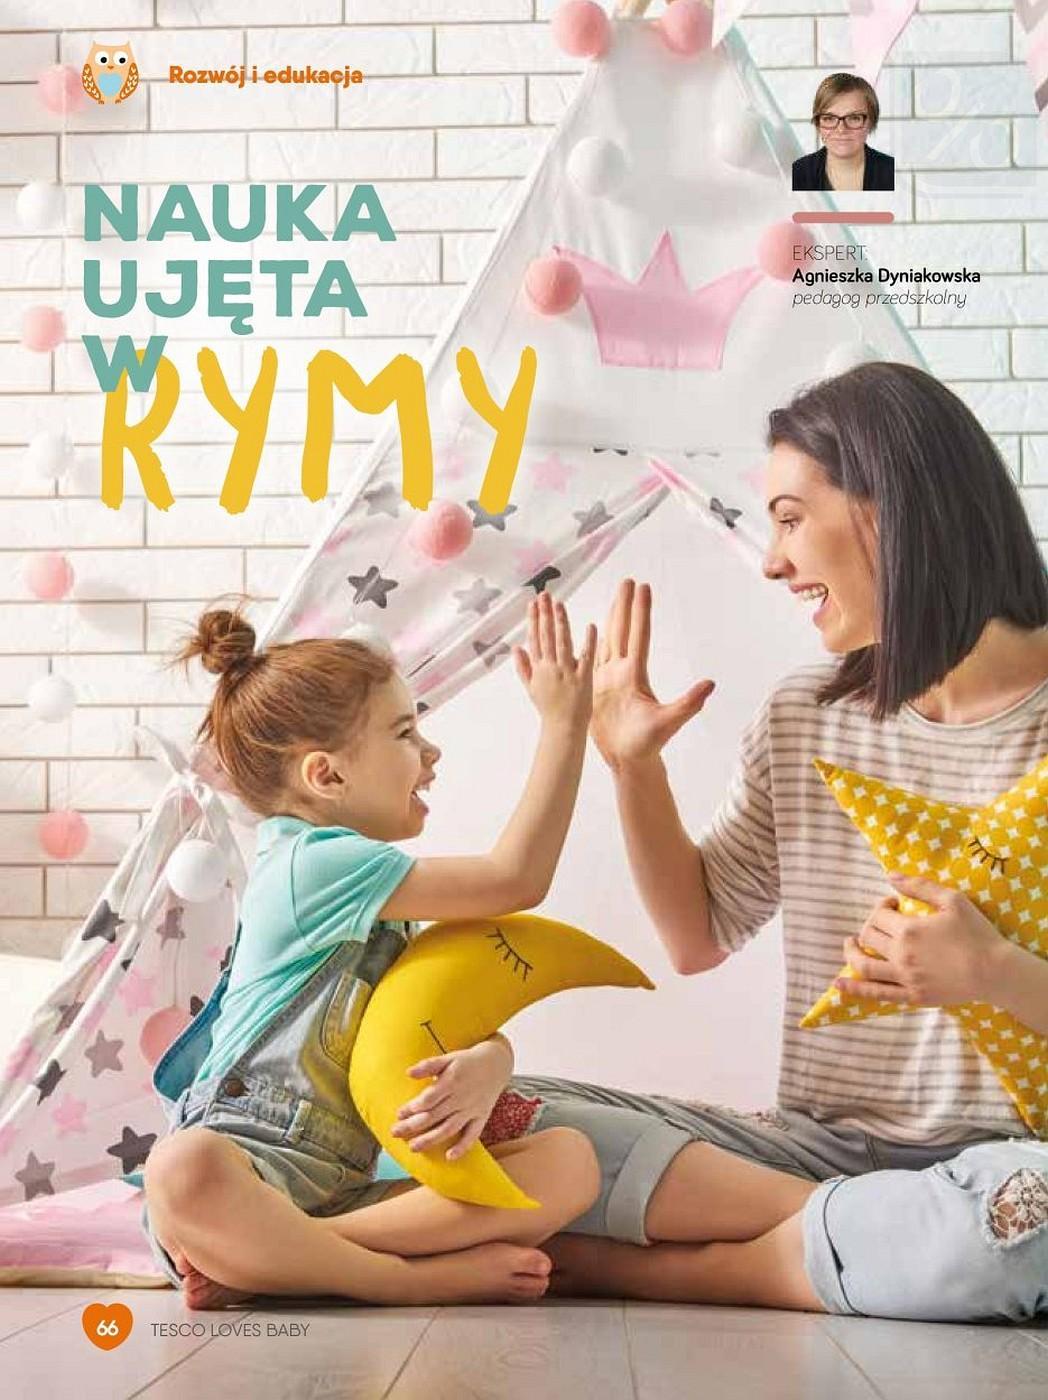 Gazetka promocyjna Tesco do 31/10/2018 str.66